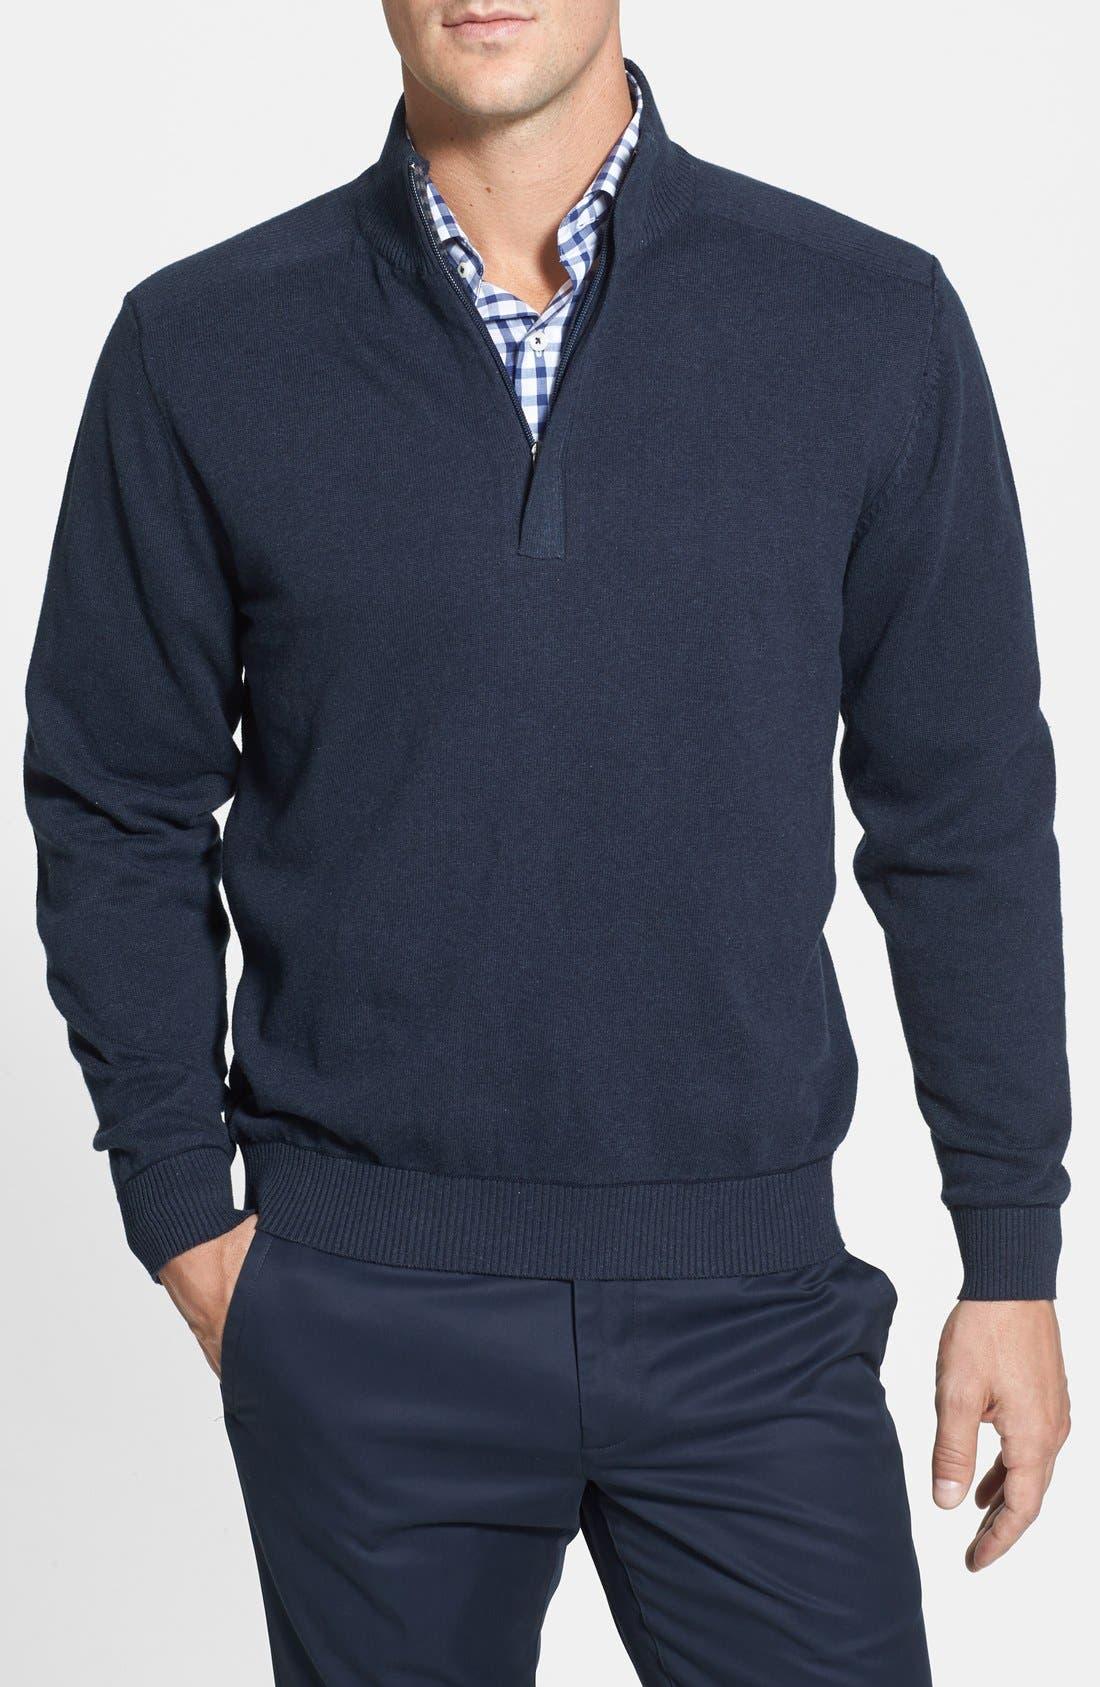 CUTTER & BUCK,                             Broadview Half Zip Sweater,                             Main thumbnail 1, color,                             480